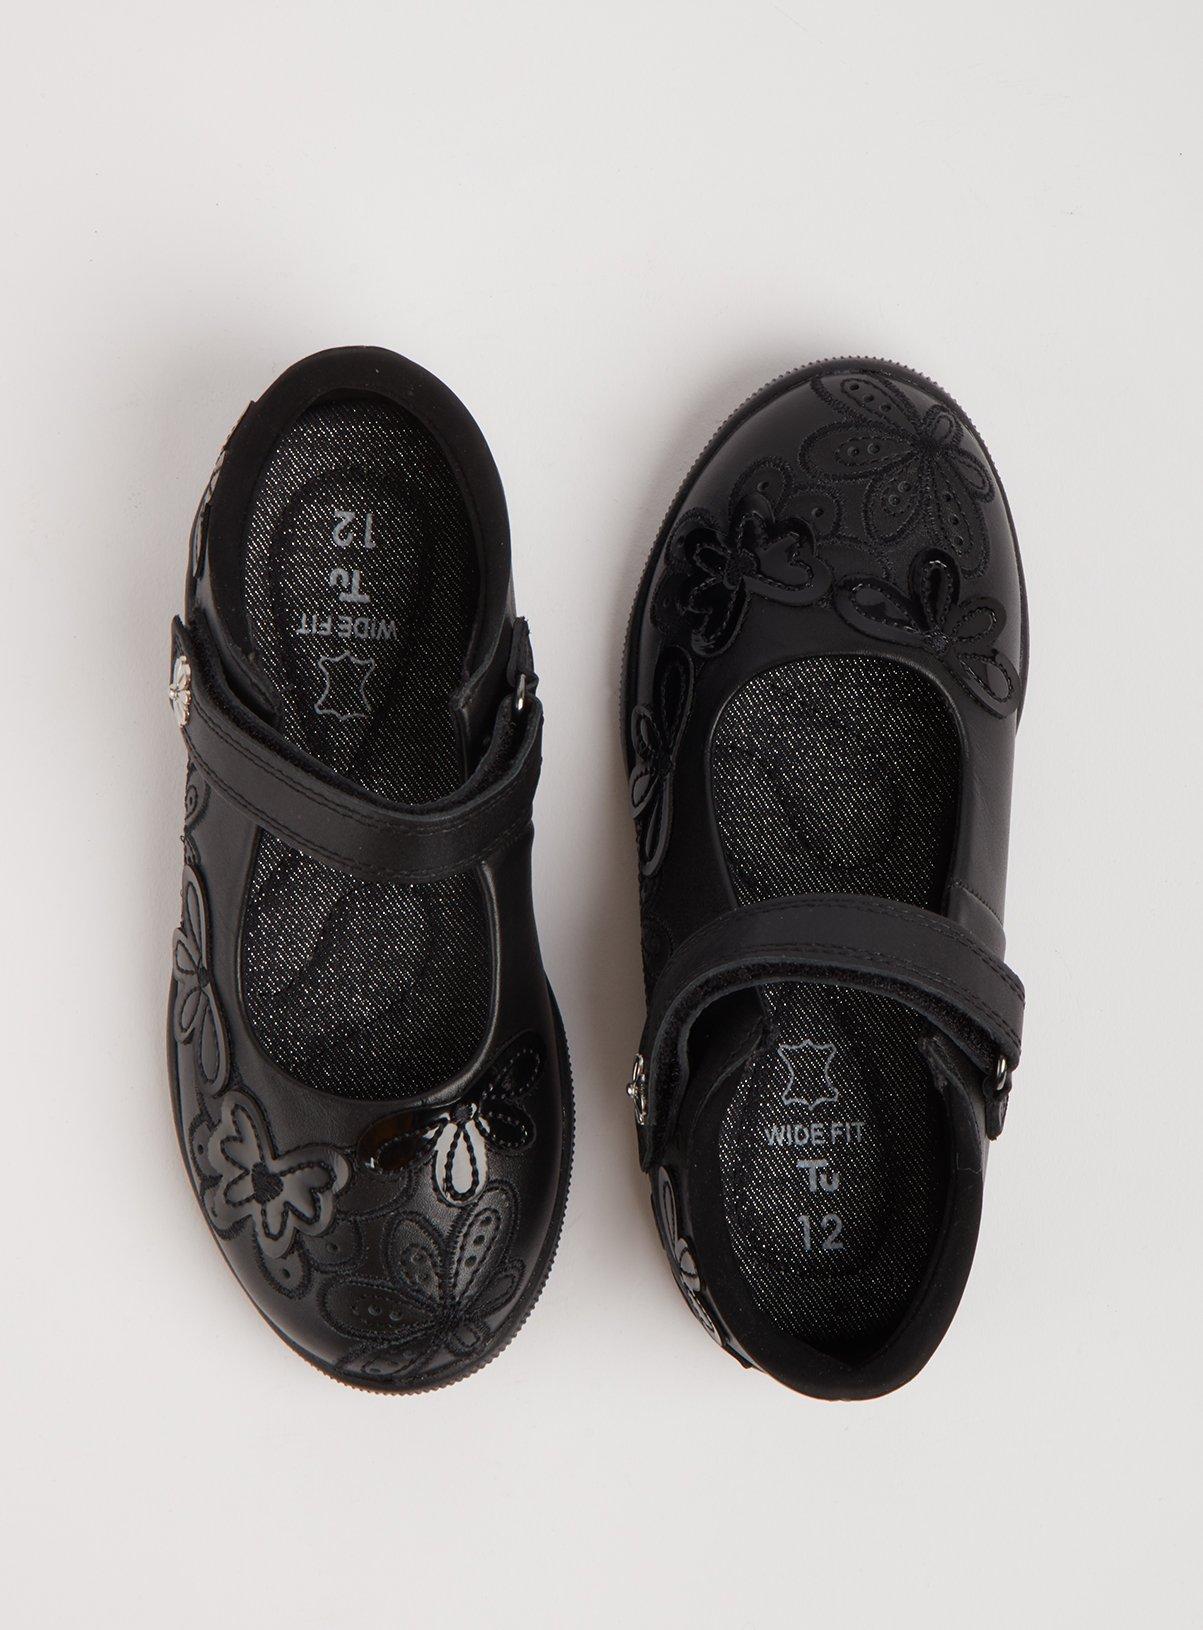 Black Leather Floral Strap Wide Fit School Shoes - 9 Infant